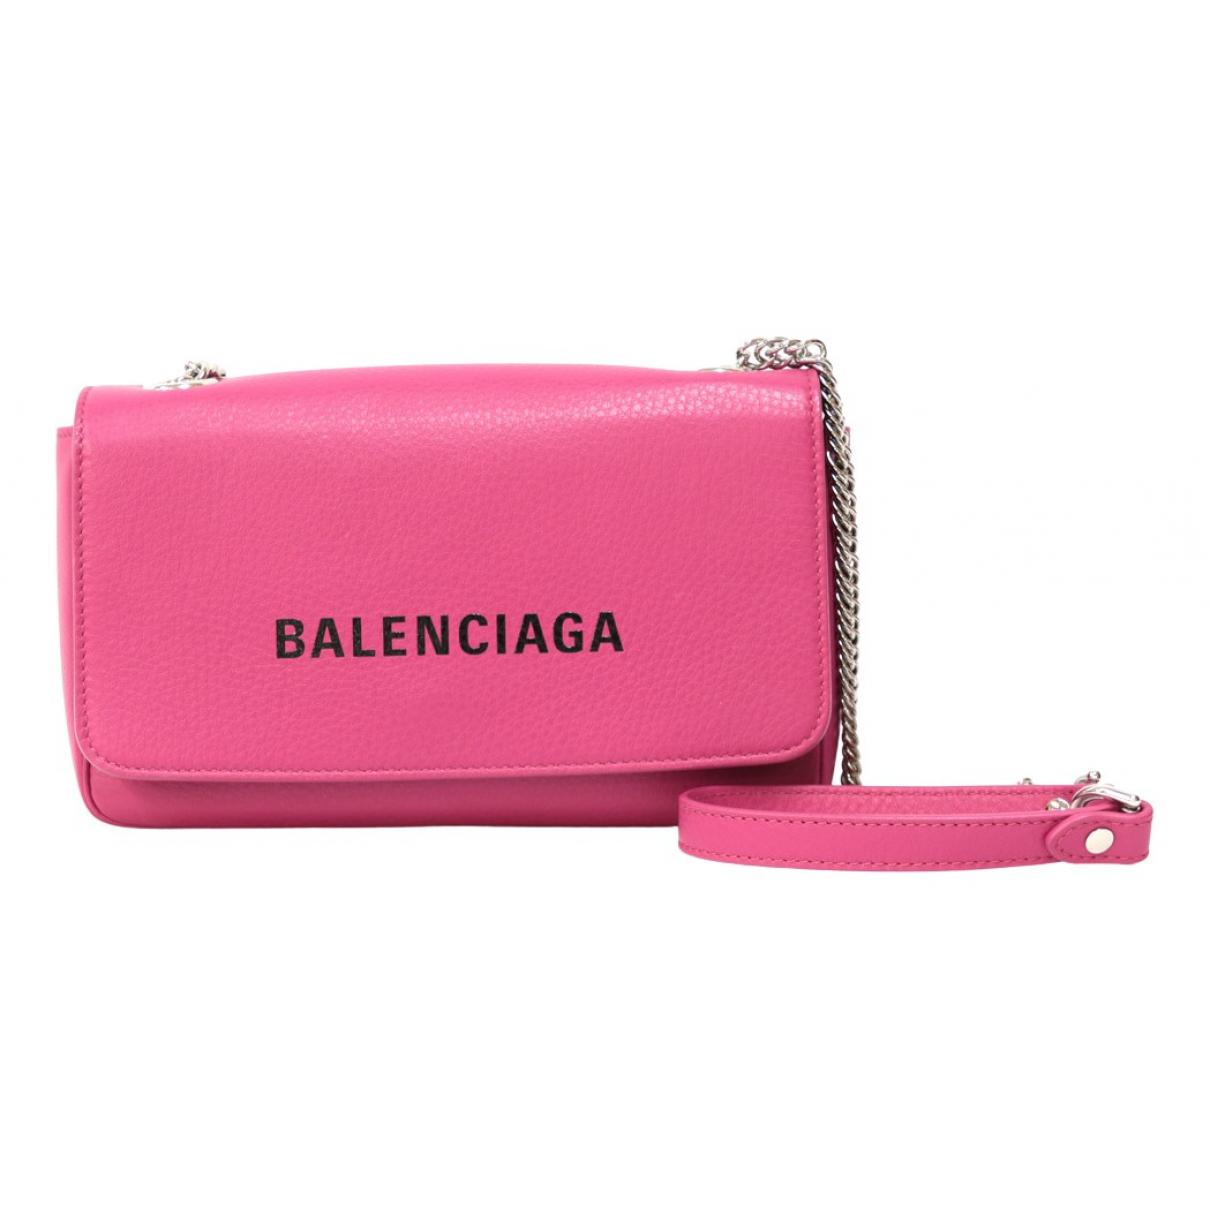 Balenciaga Everyday Pink Leather handbag for Women \N